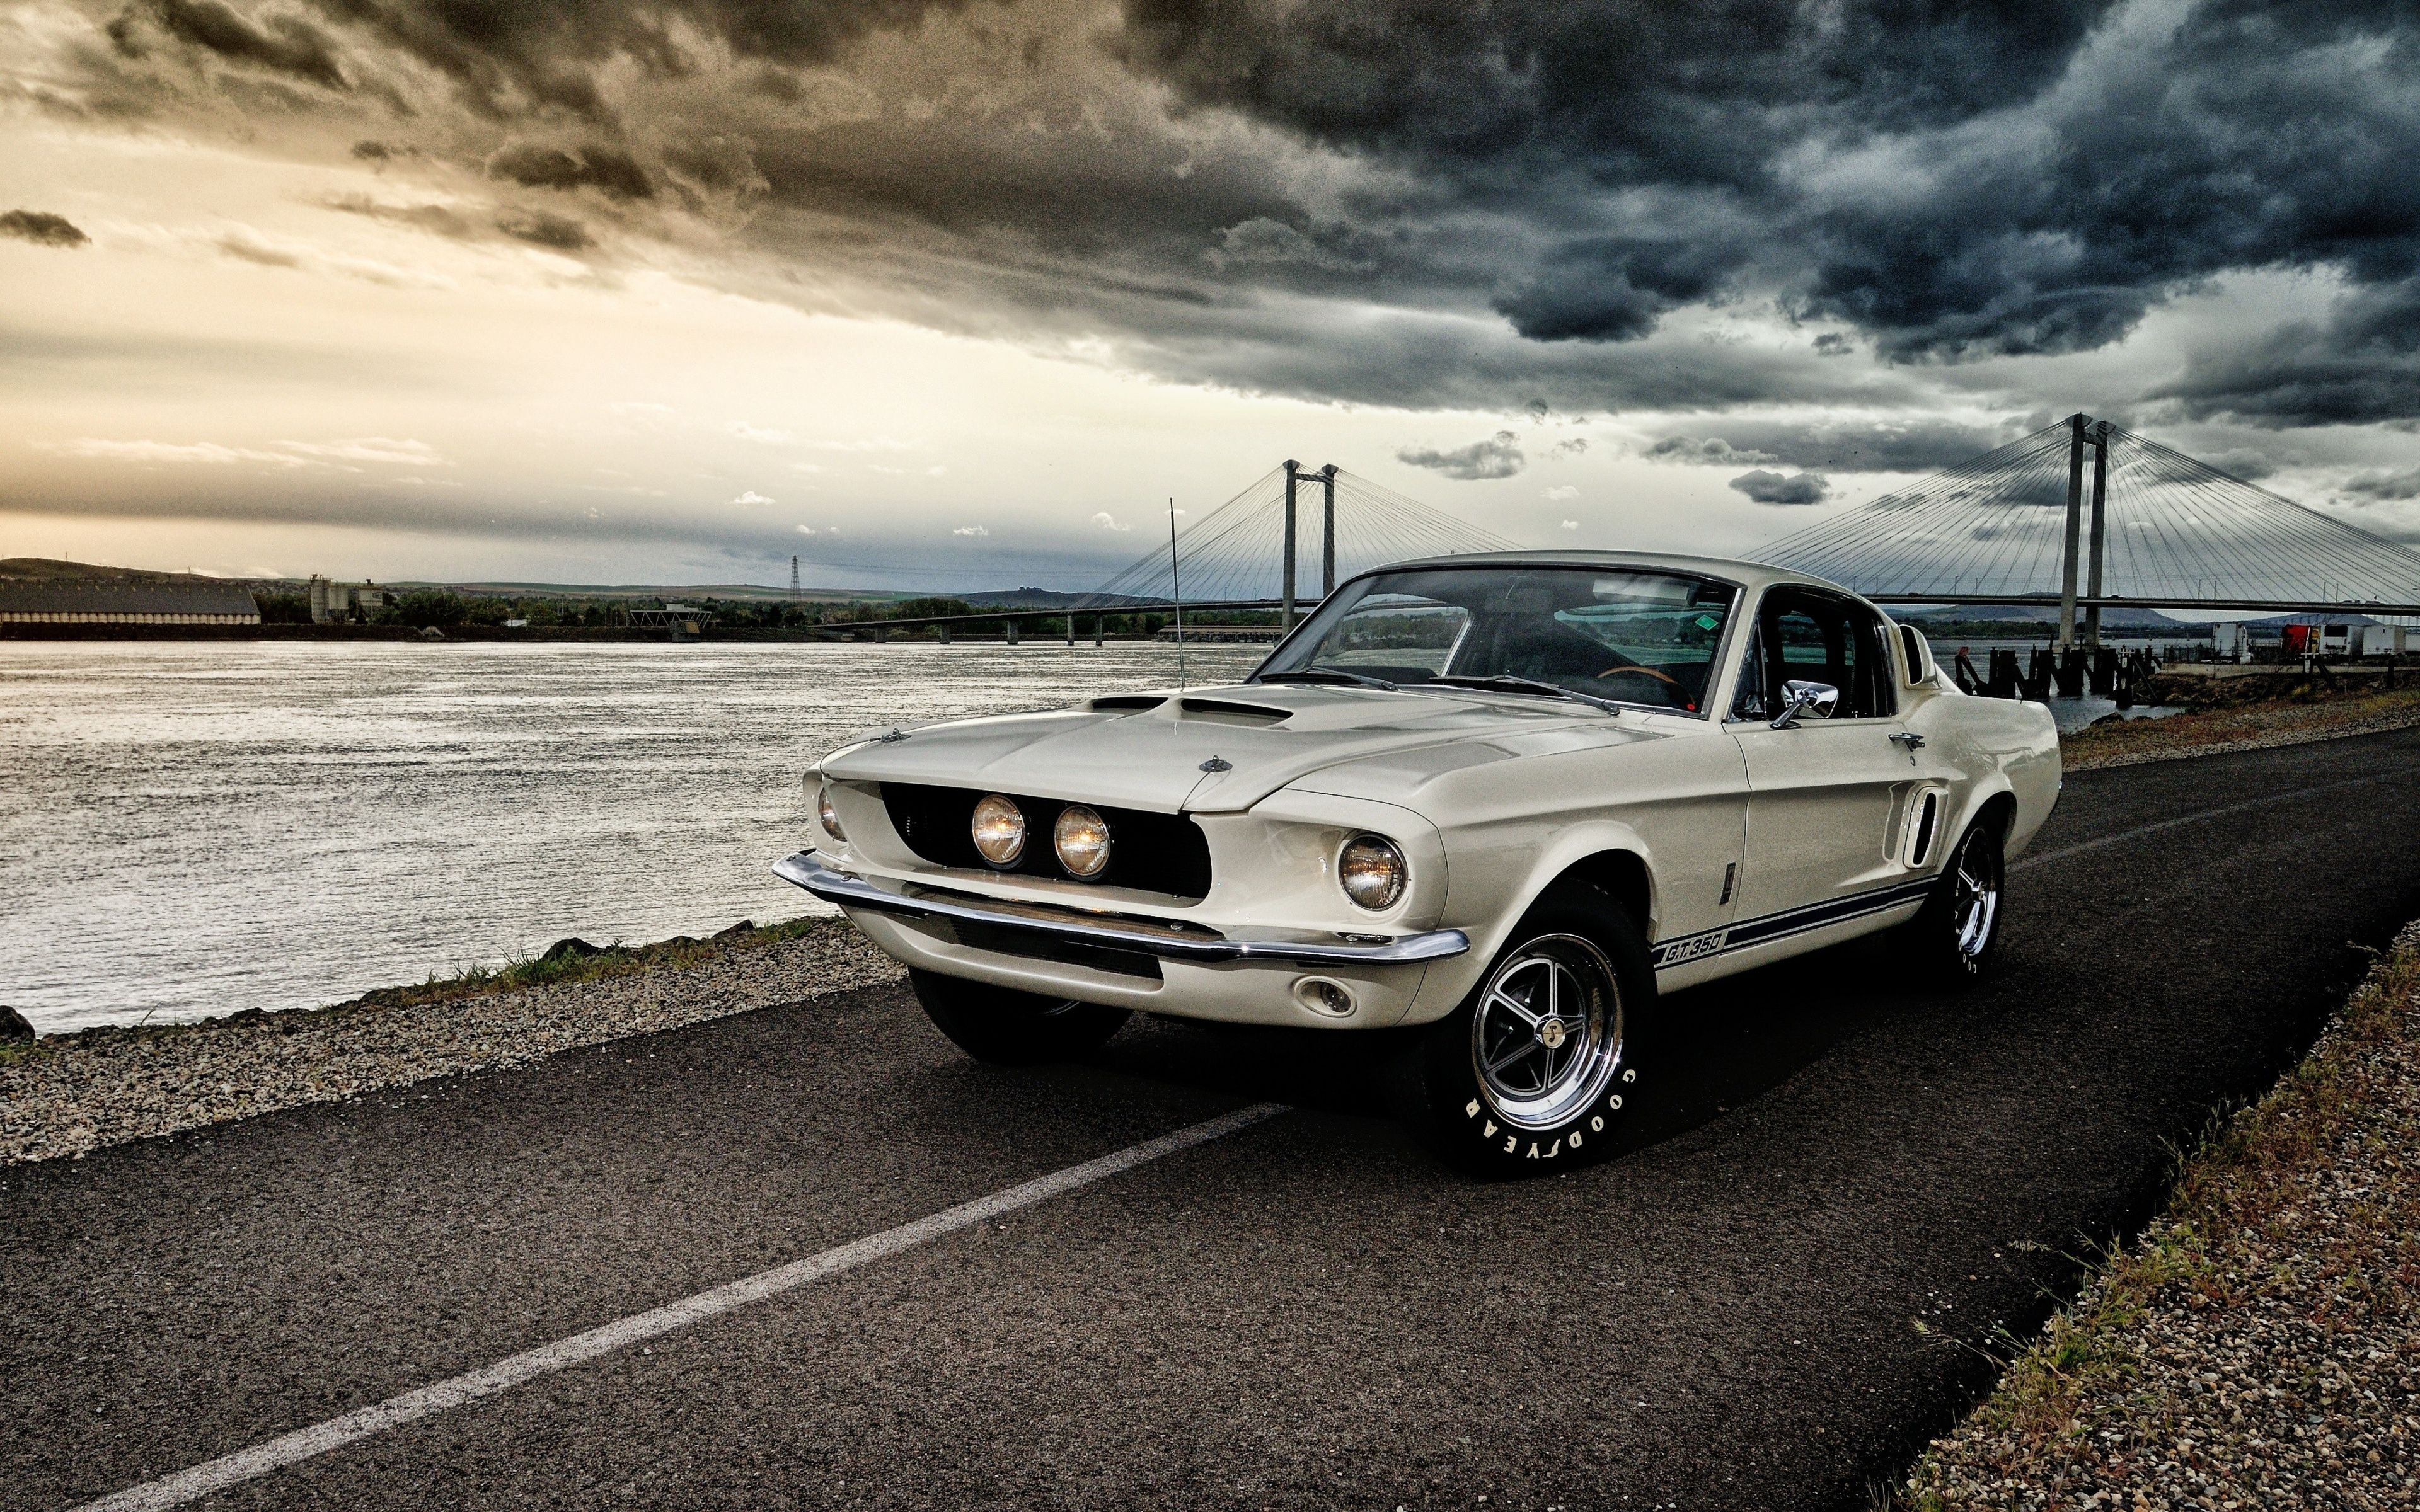 Ford Mustang 1967 Wallpaper 1920X1080